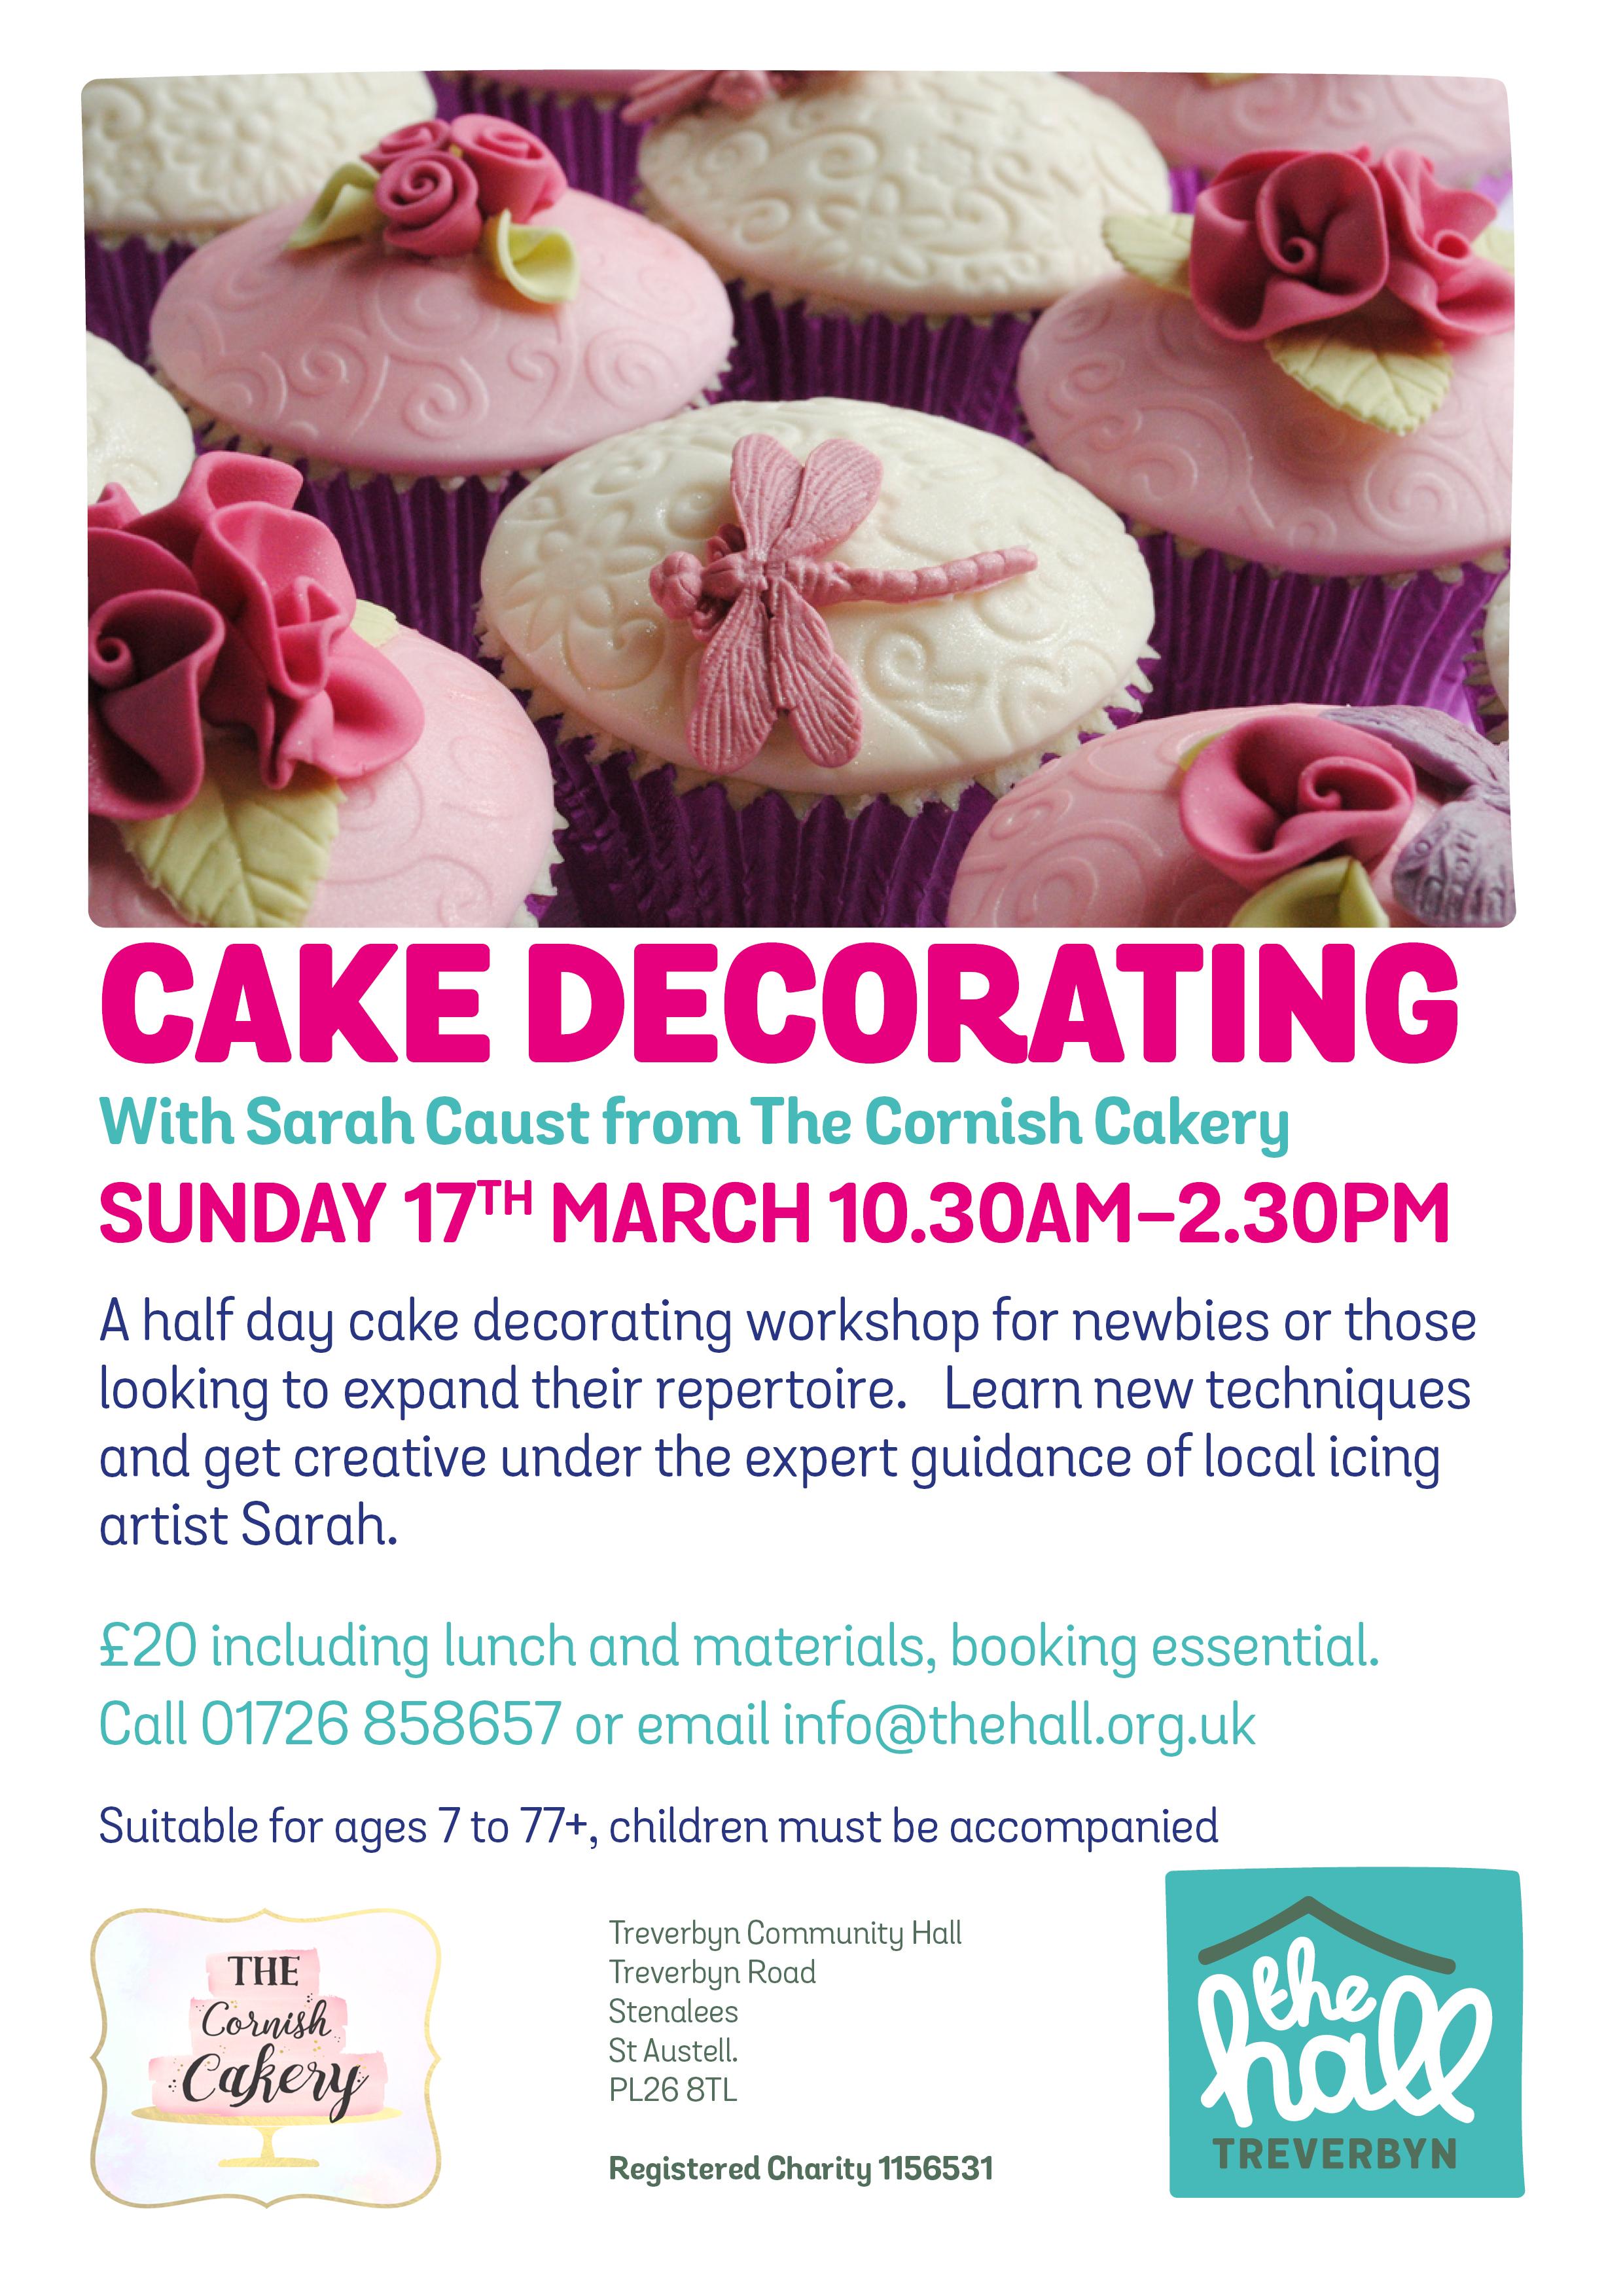 Cake decorating 17 mar 19